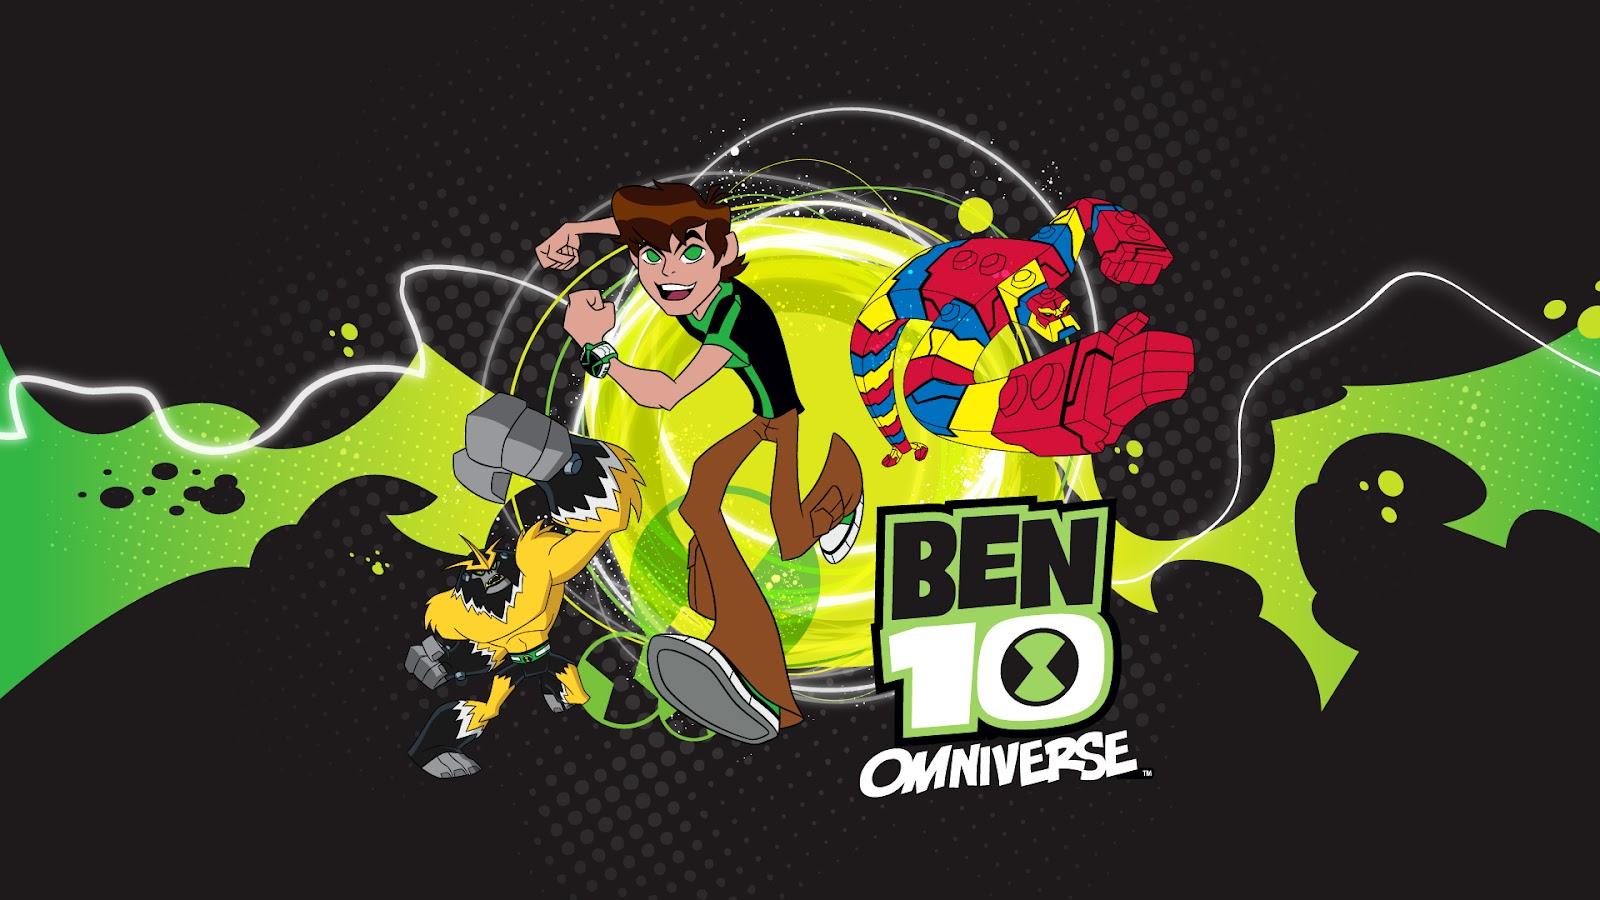 mobile 9 ben 10 game download